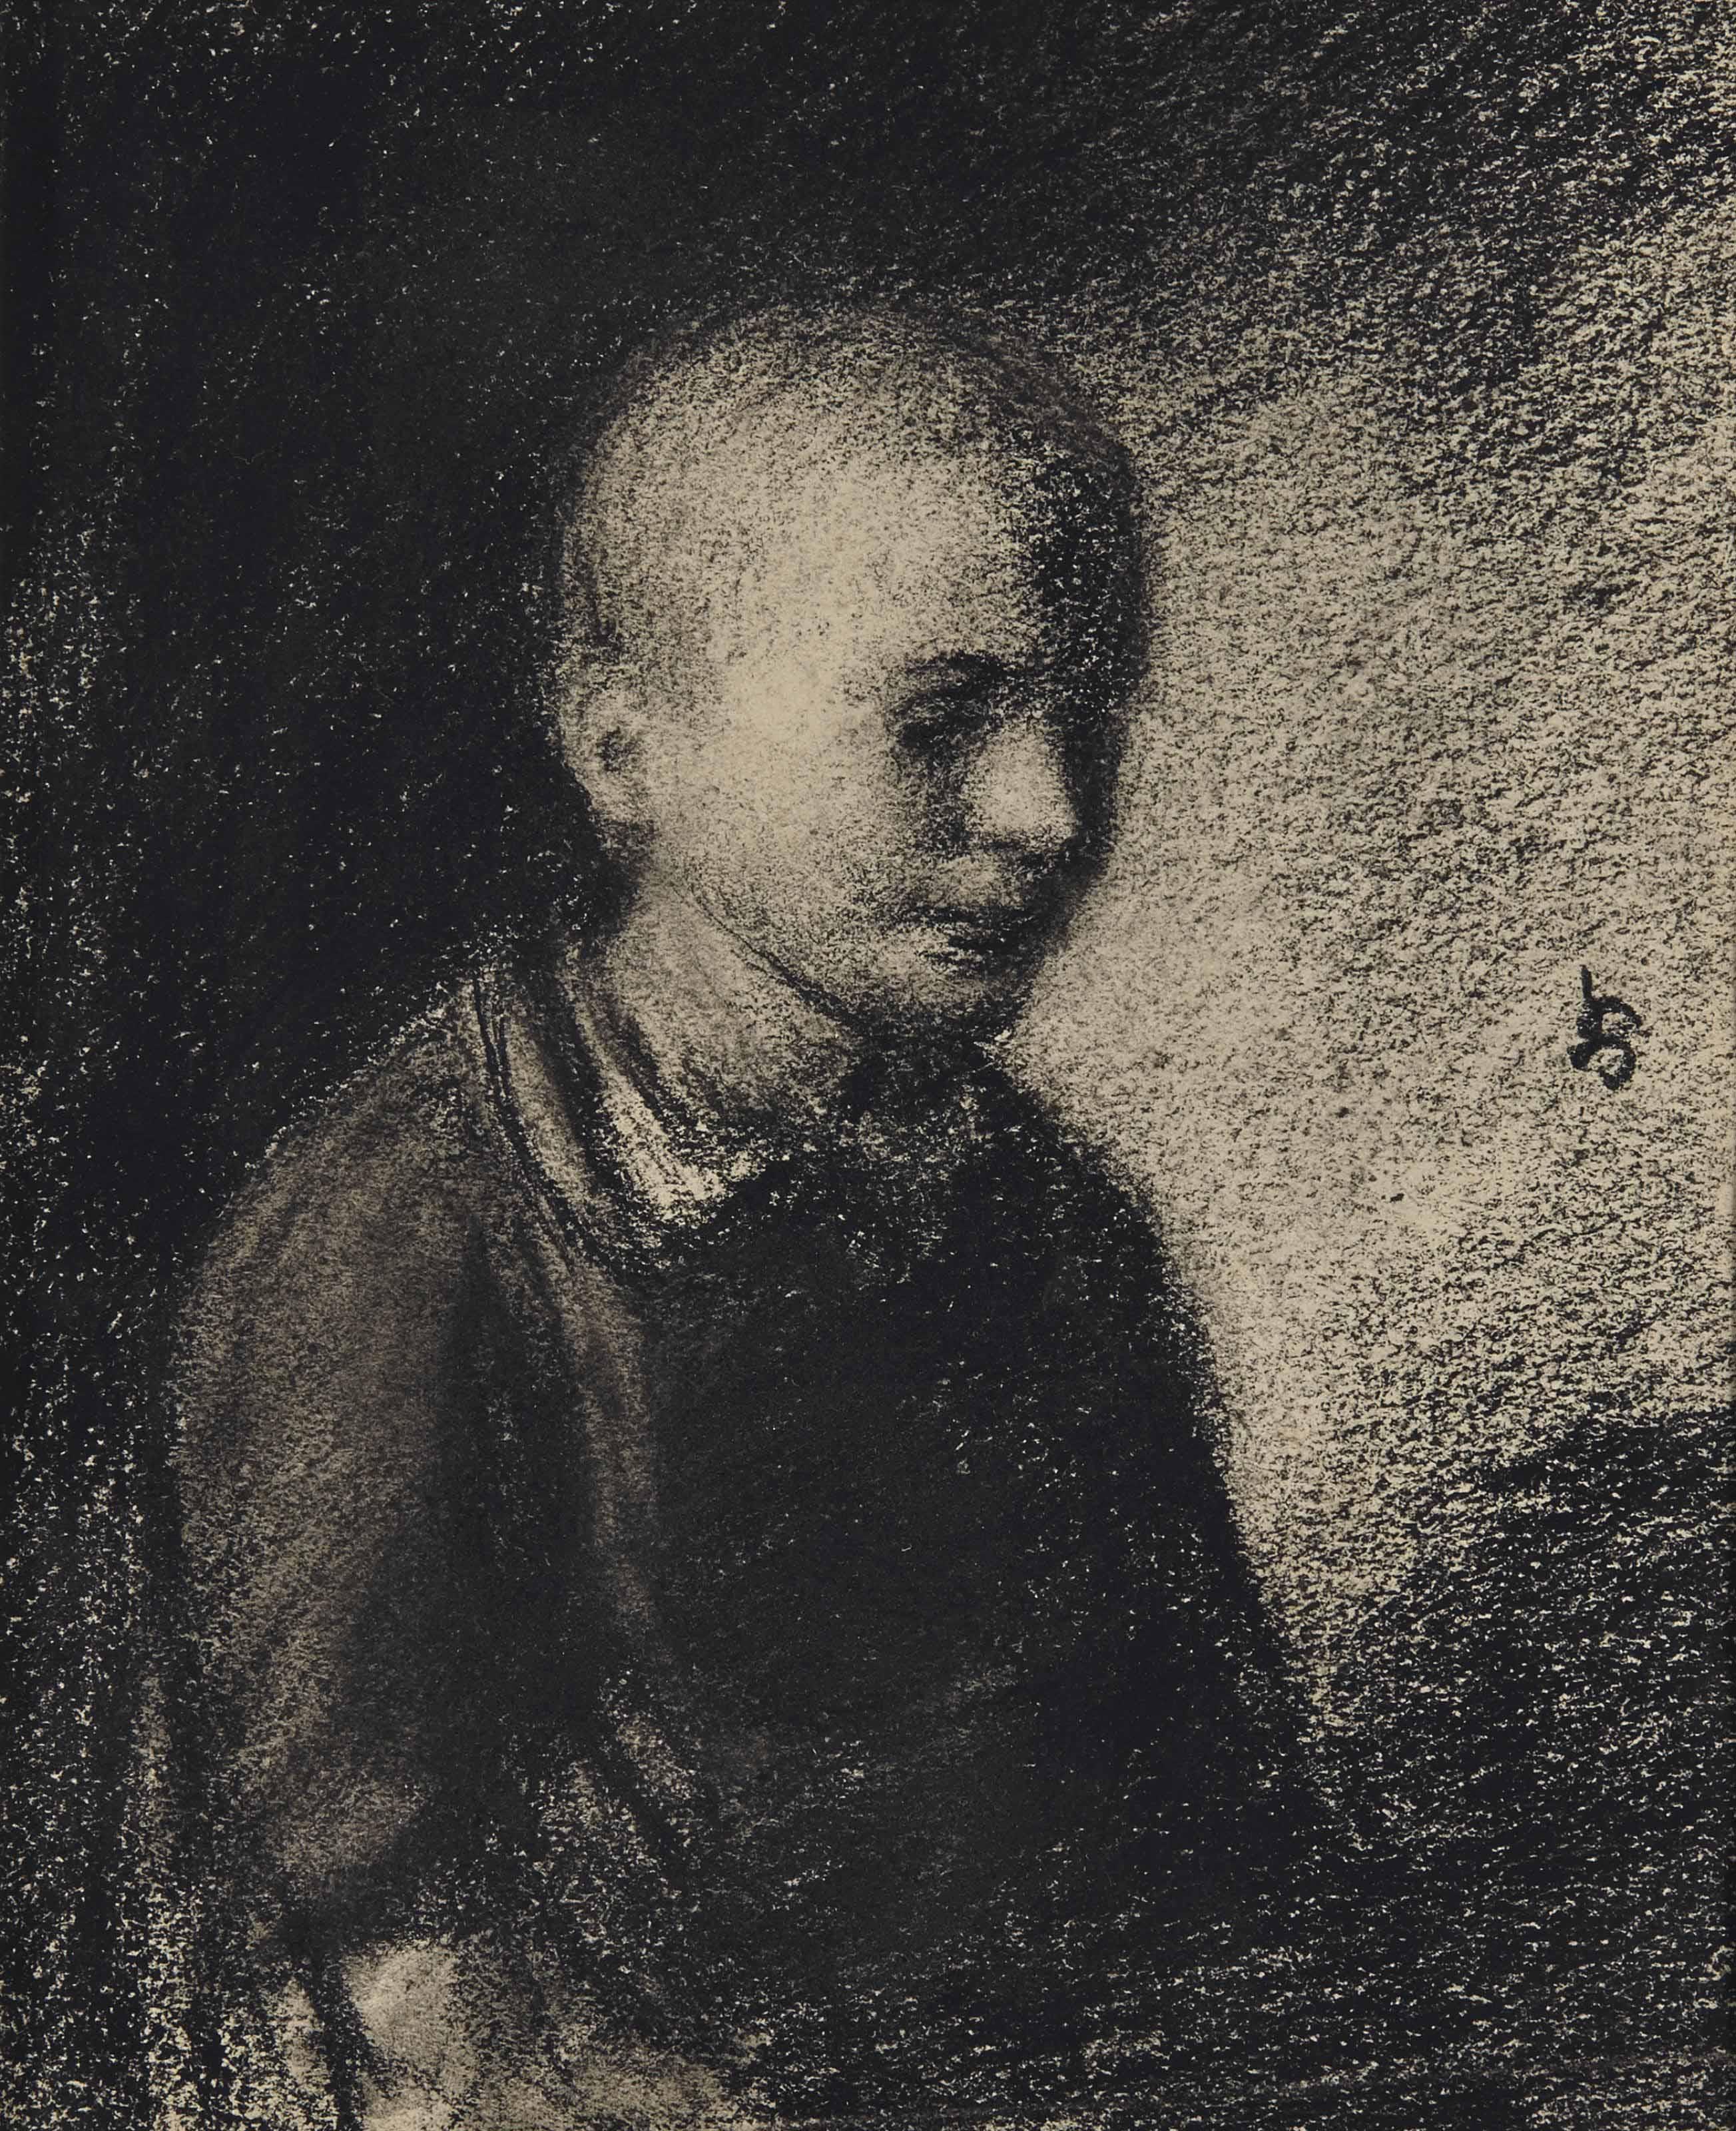 PORTRAIT DE KOBE SMITS (RECTO); INTÉRIEUR AU VIEILLARD (VERSO)